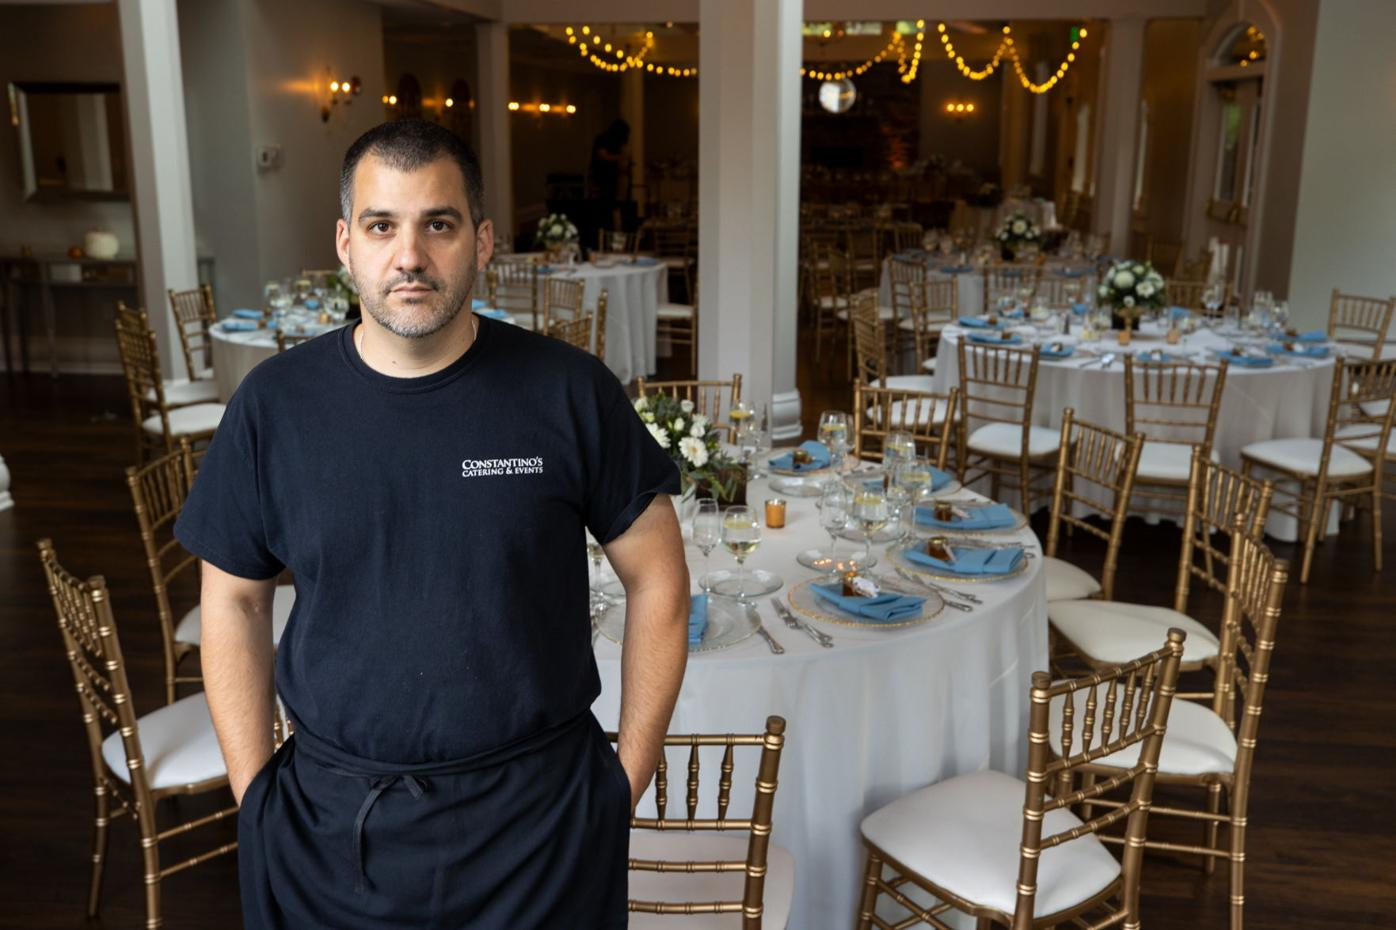 Federal grants provide lifeline for Lackawanna County restaurant struggling amid pandemic